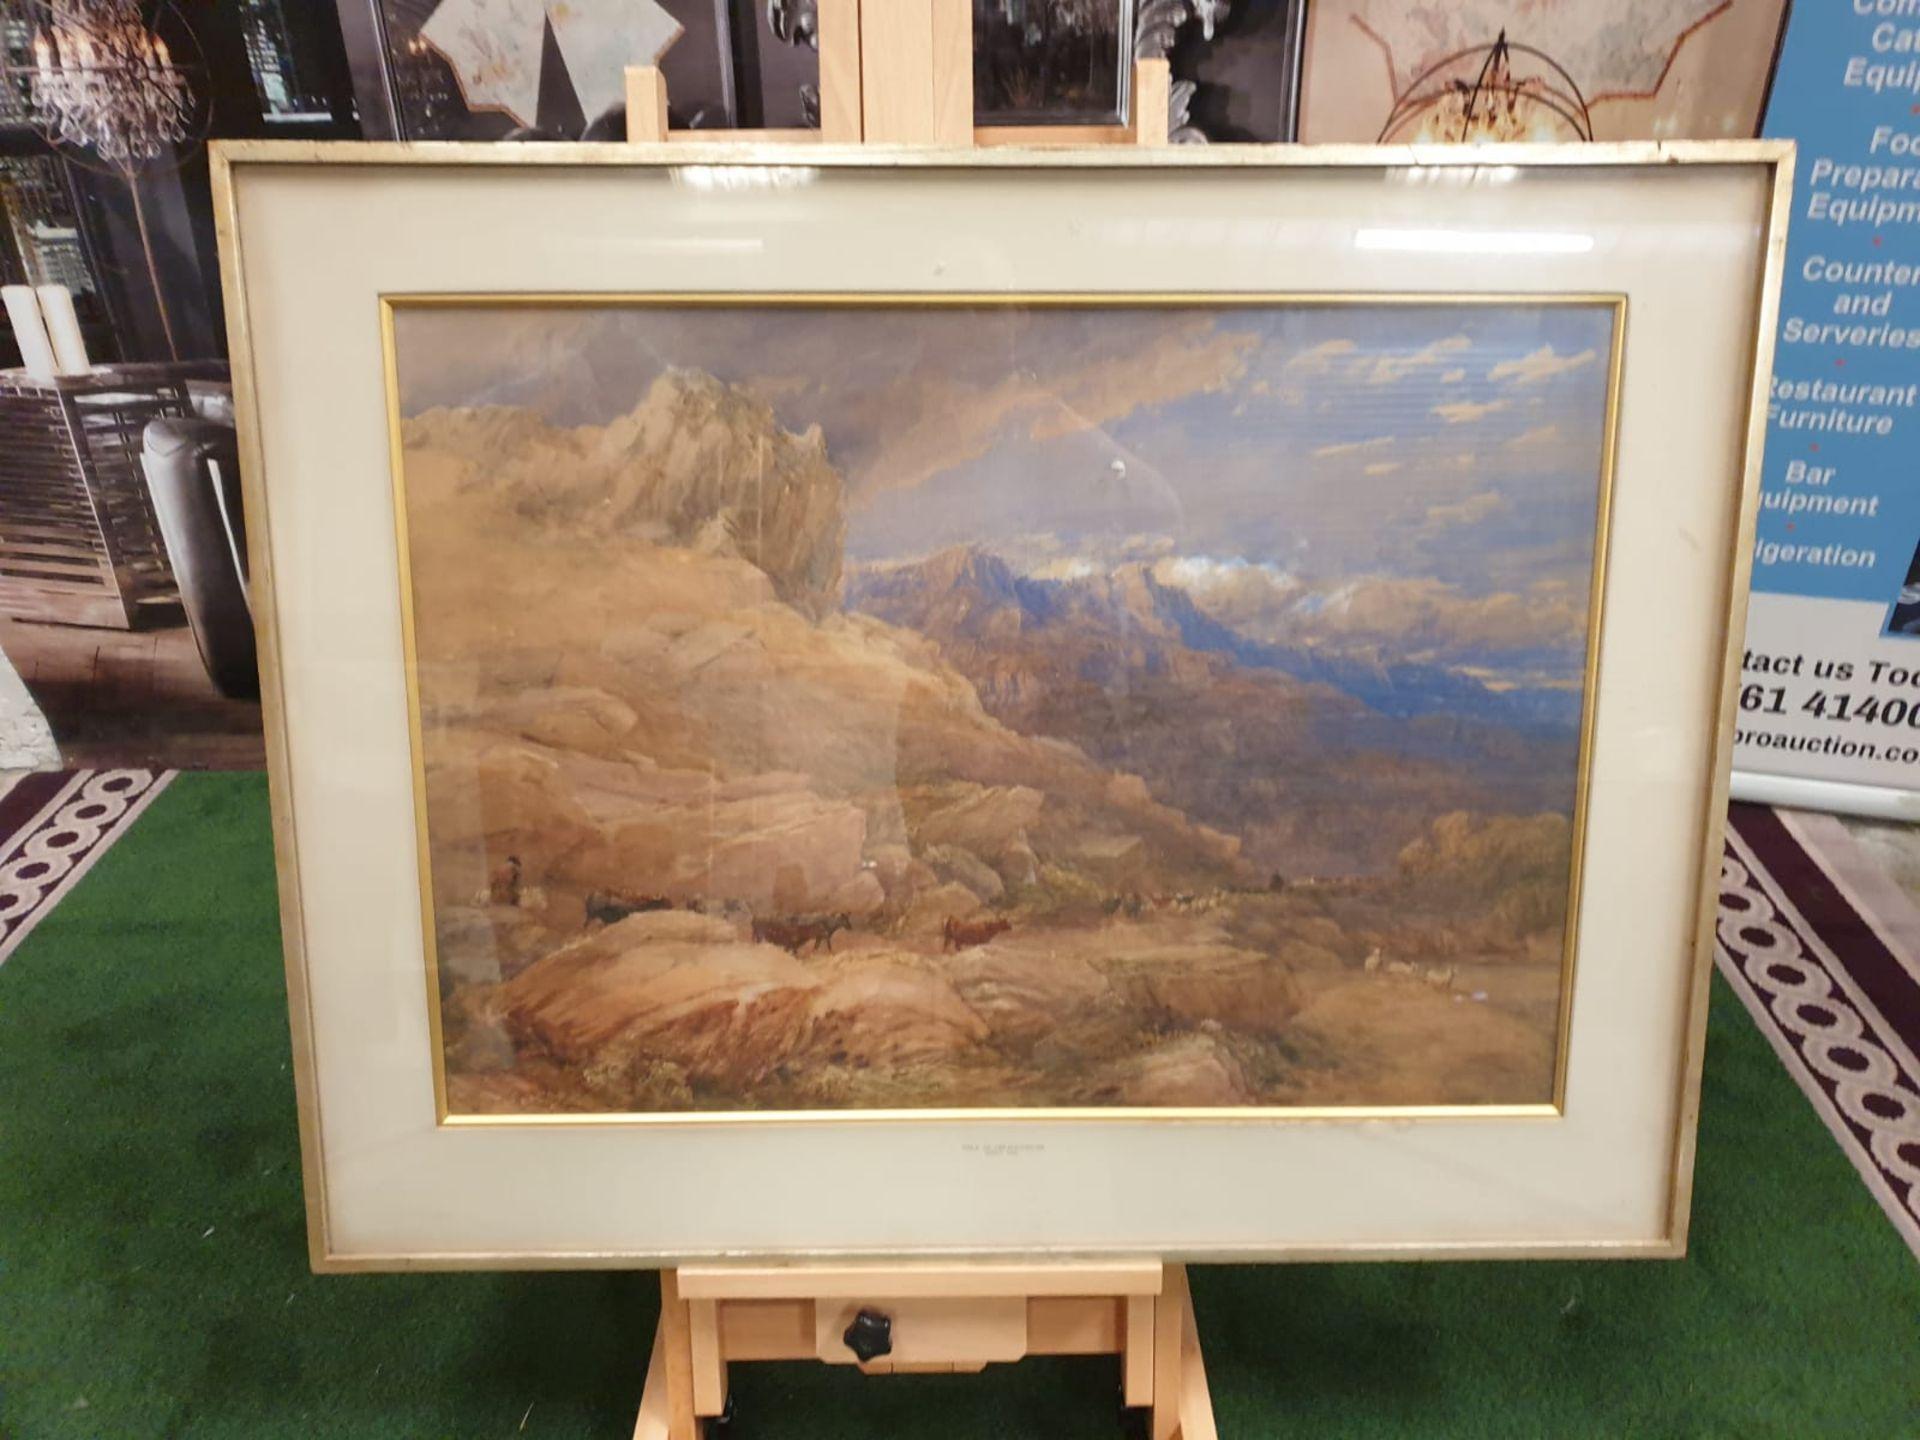 Framed print The Vale of Dolwyddelan David Cox Date: 1846 David Cox (29 April 1783 – 7 June